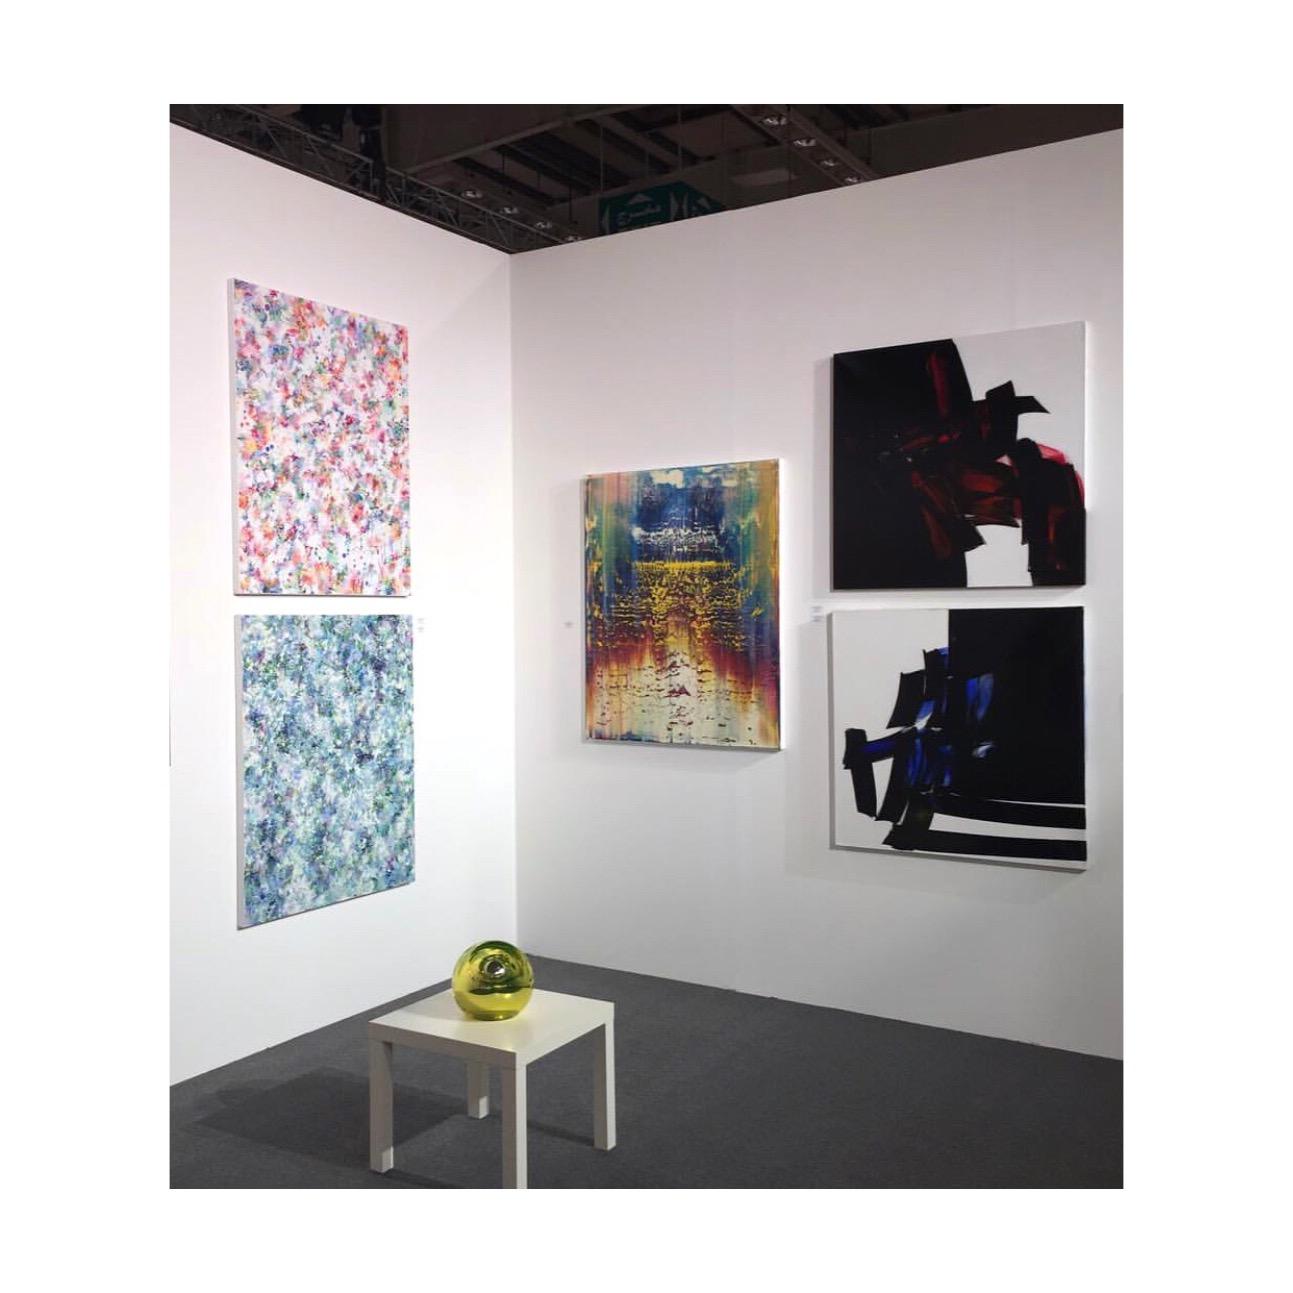 Alexandra De Grave artiste peintre painting artist exposition